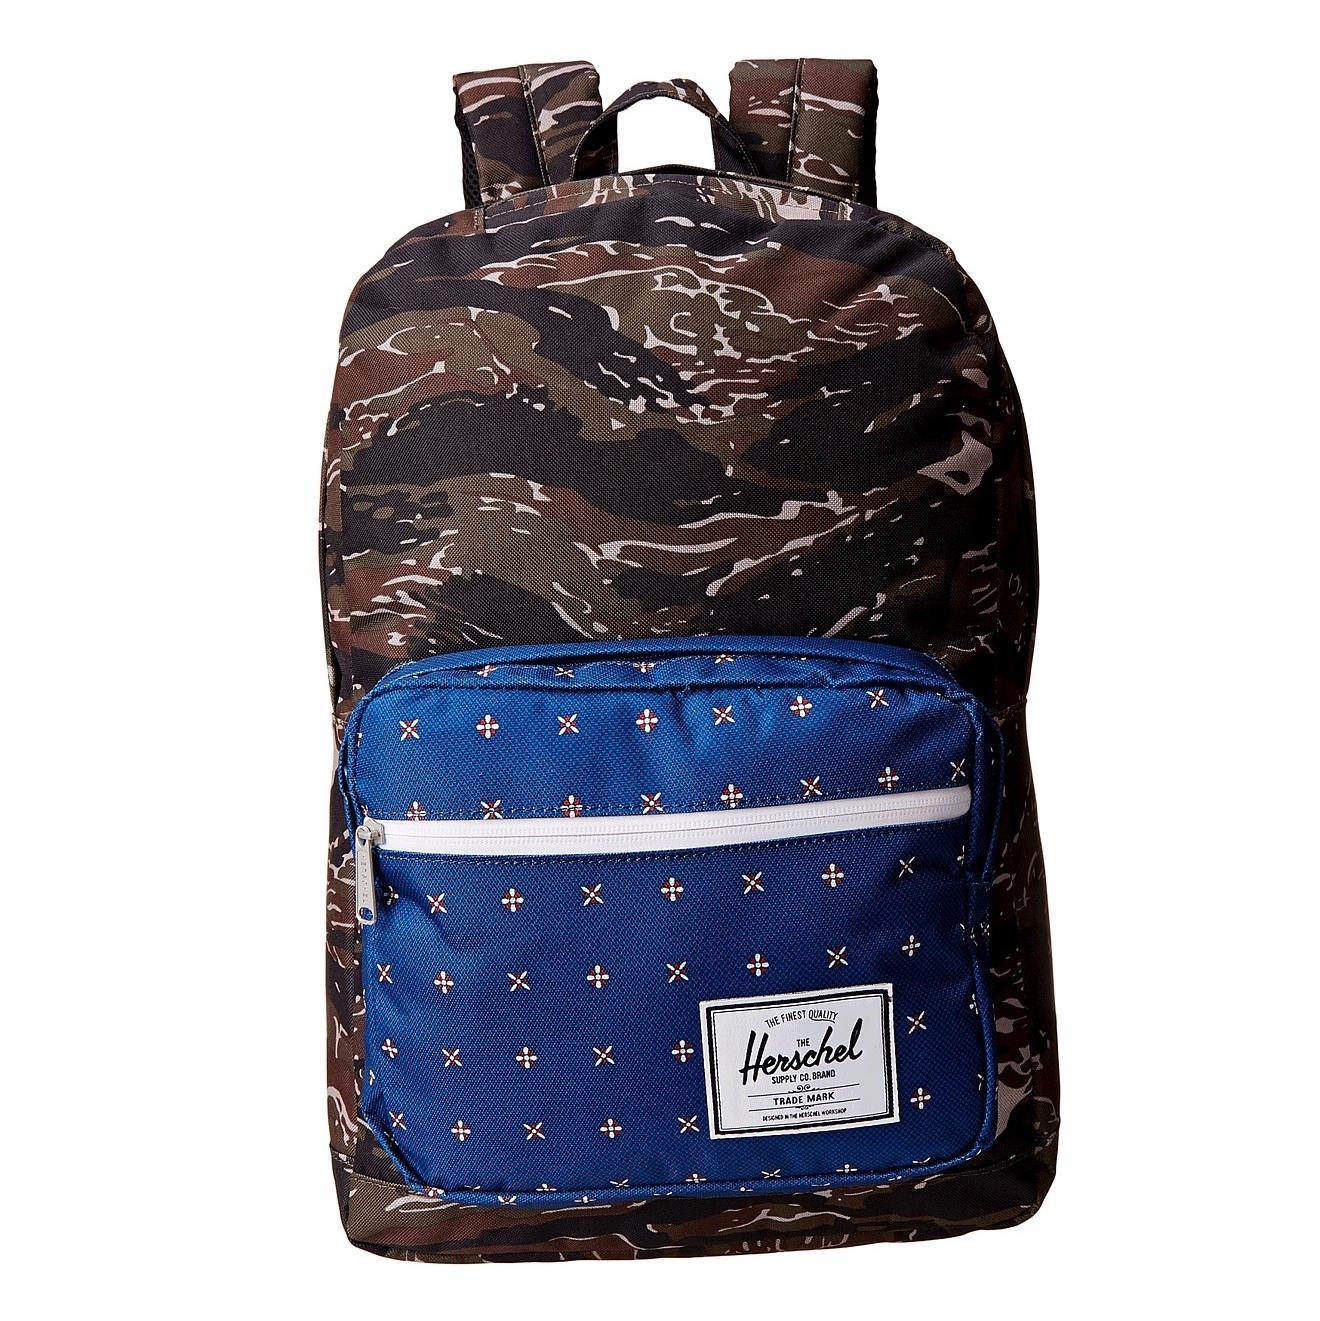 Hsin 85折現貨Herschel Pop Quiz虎紋迷彩Camo深藍帆布防潑水筆電多夾層實用大容量後背包